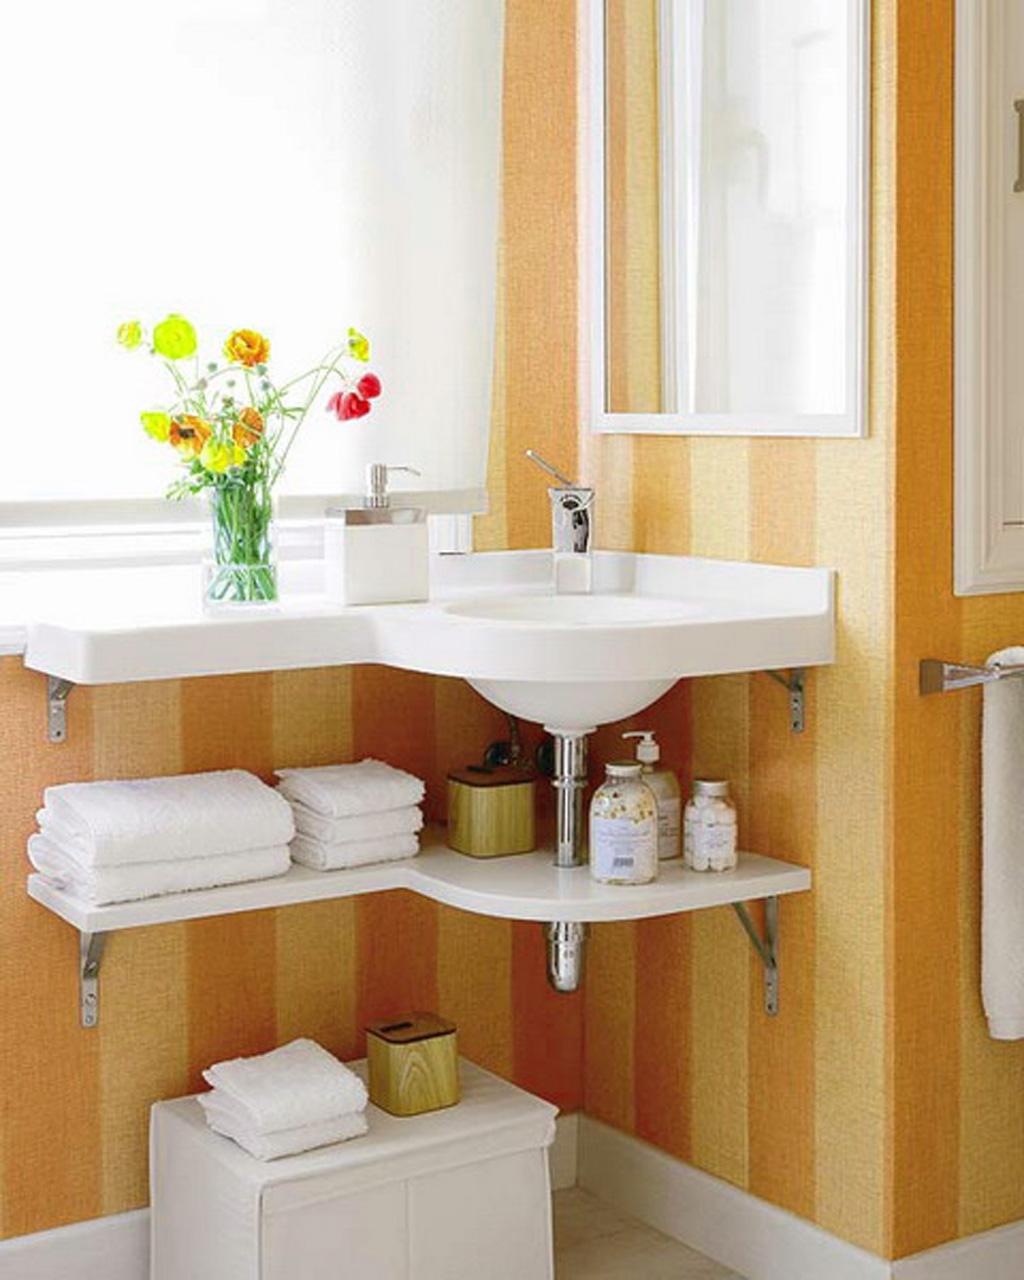 magnificent-design-ideas-minimalist-simple-bathroom-storage-stunning-bathroom-storage